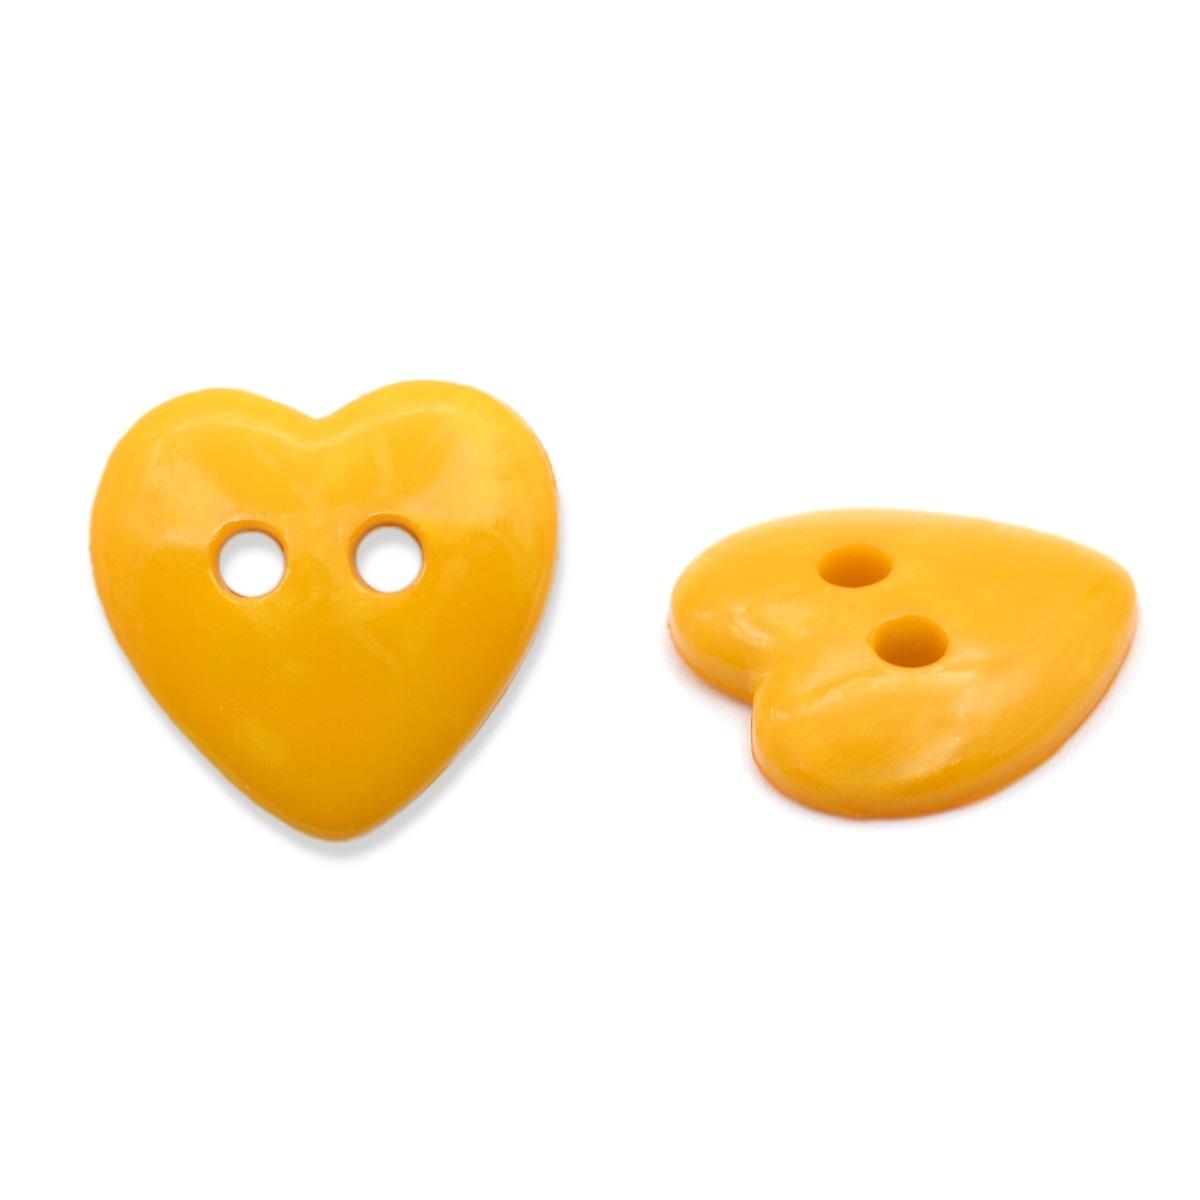 5492 Пуговица 'Сердце', 13 мм